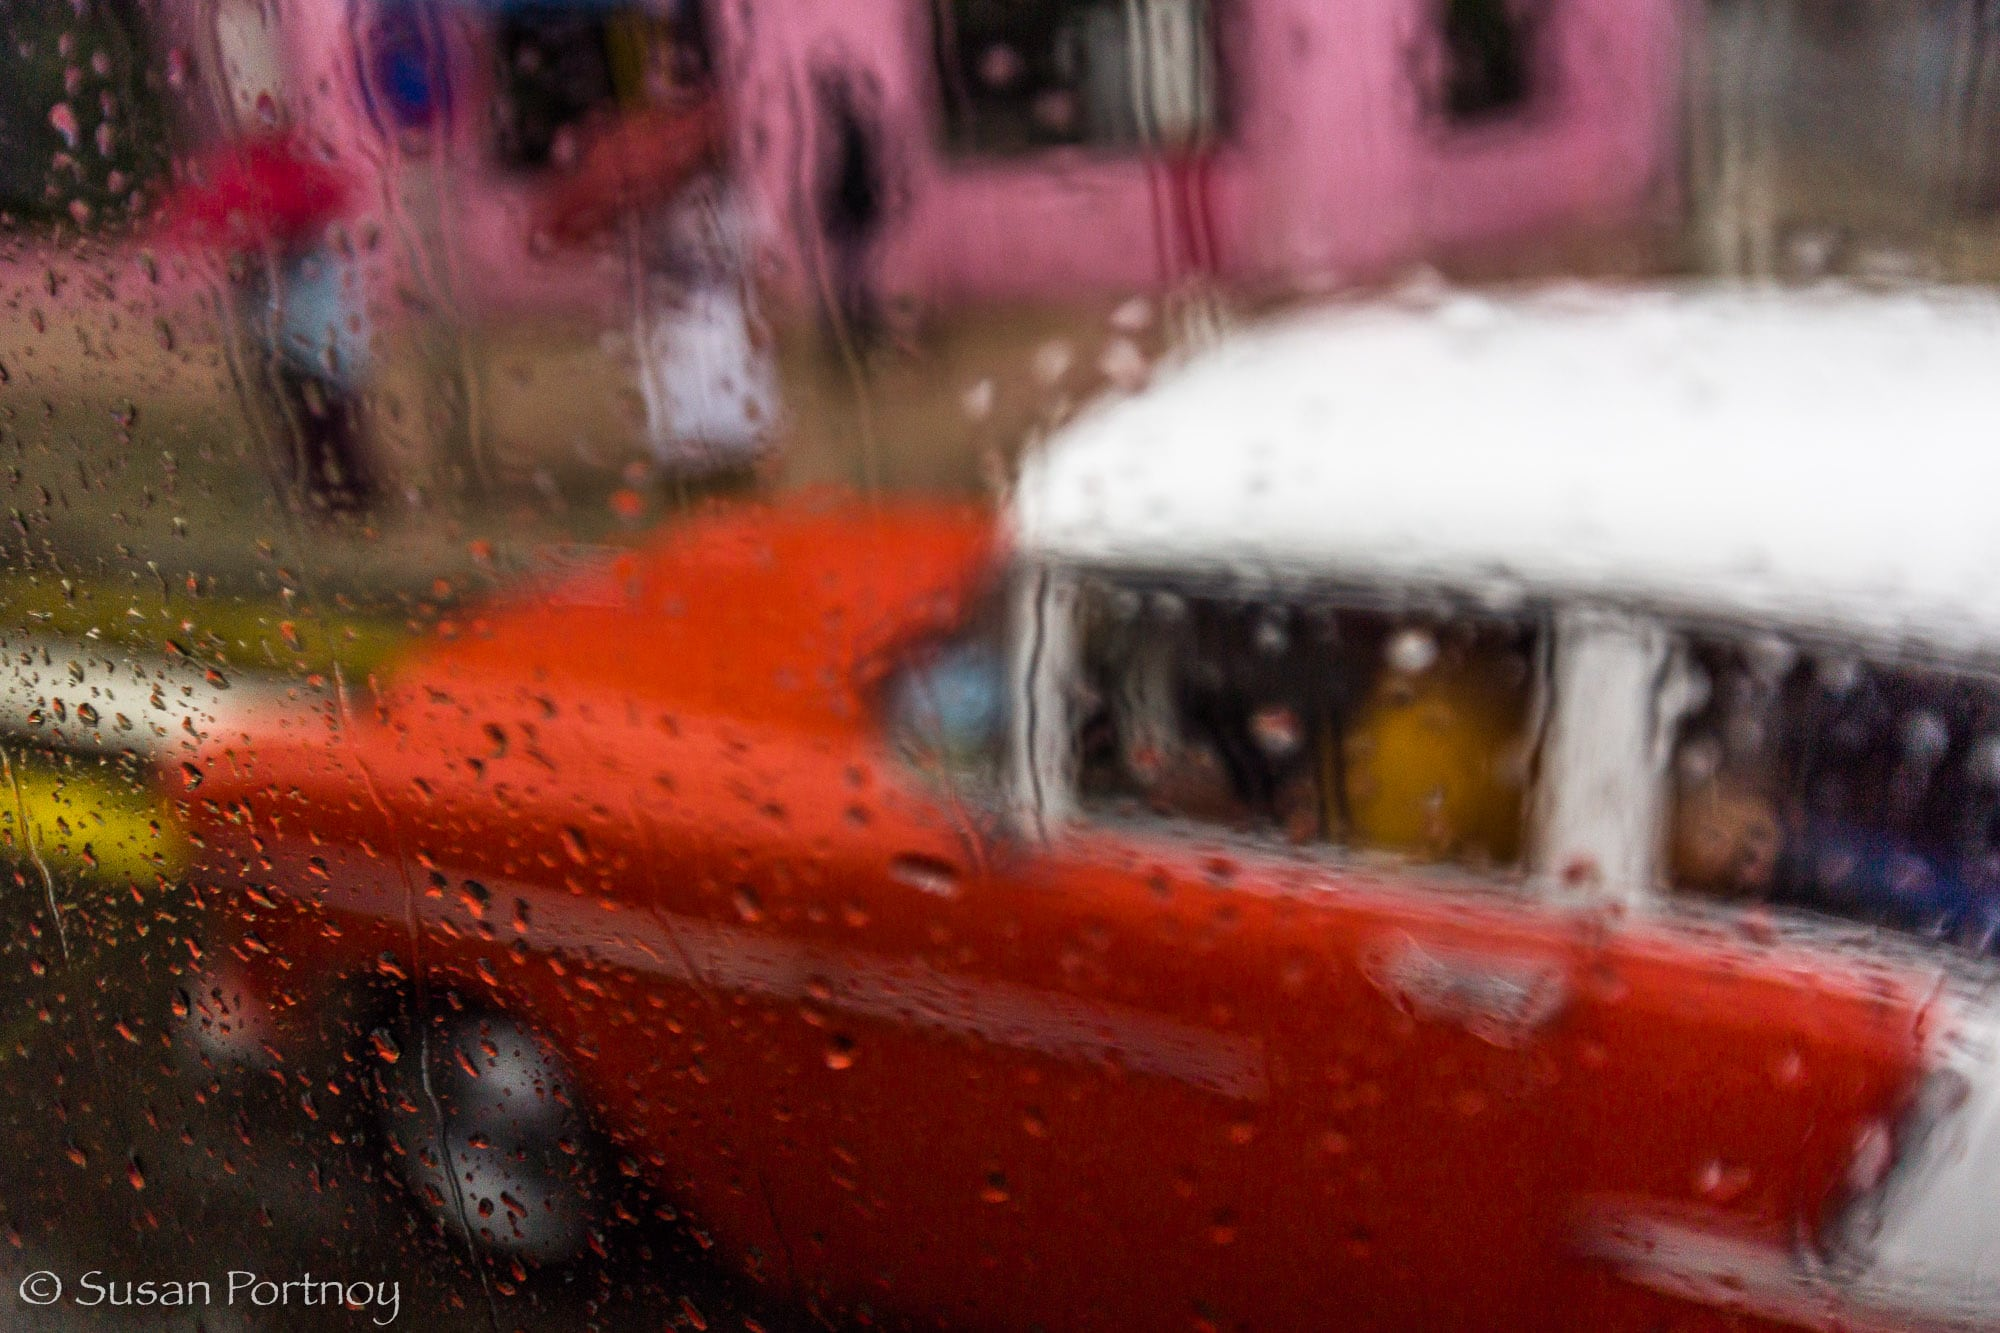 Red classic car in Havana, Cuba as seen through a rainy window